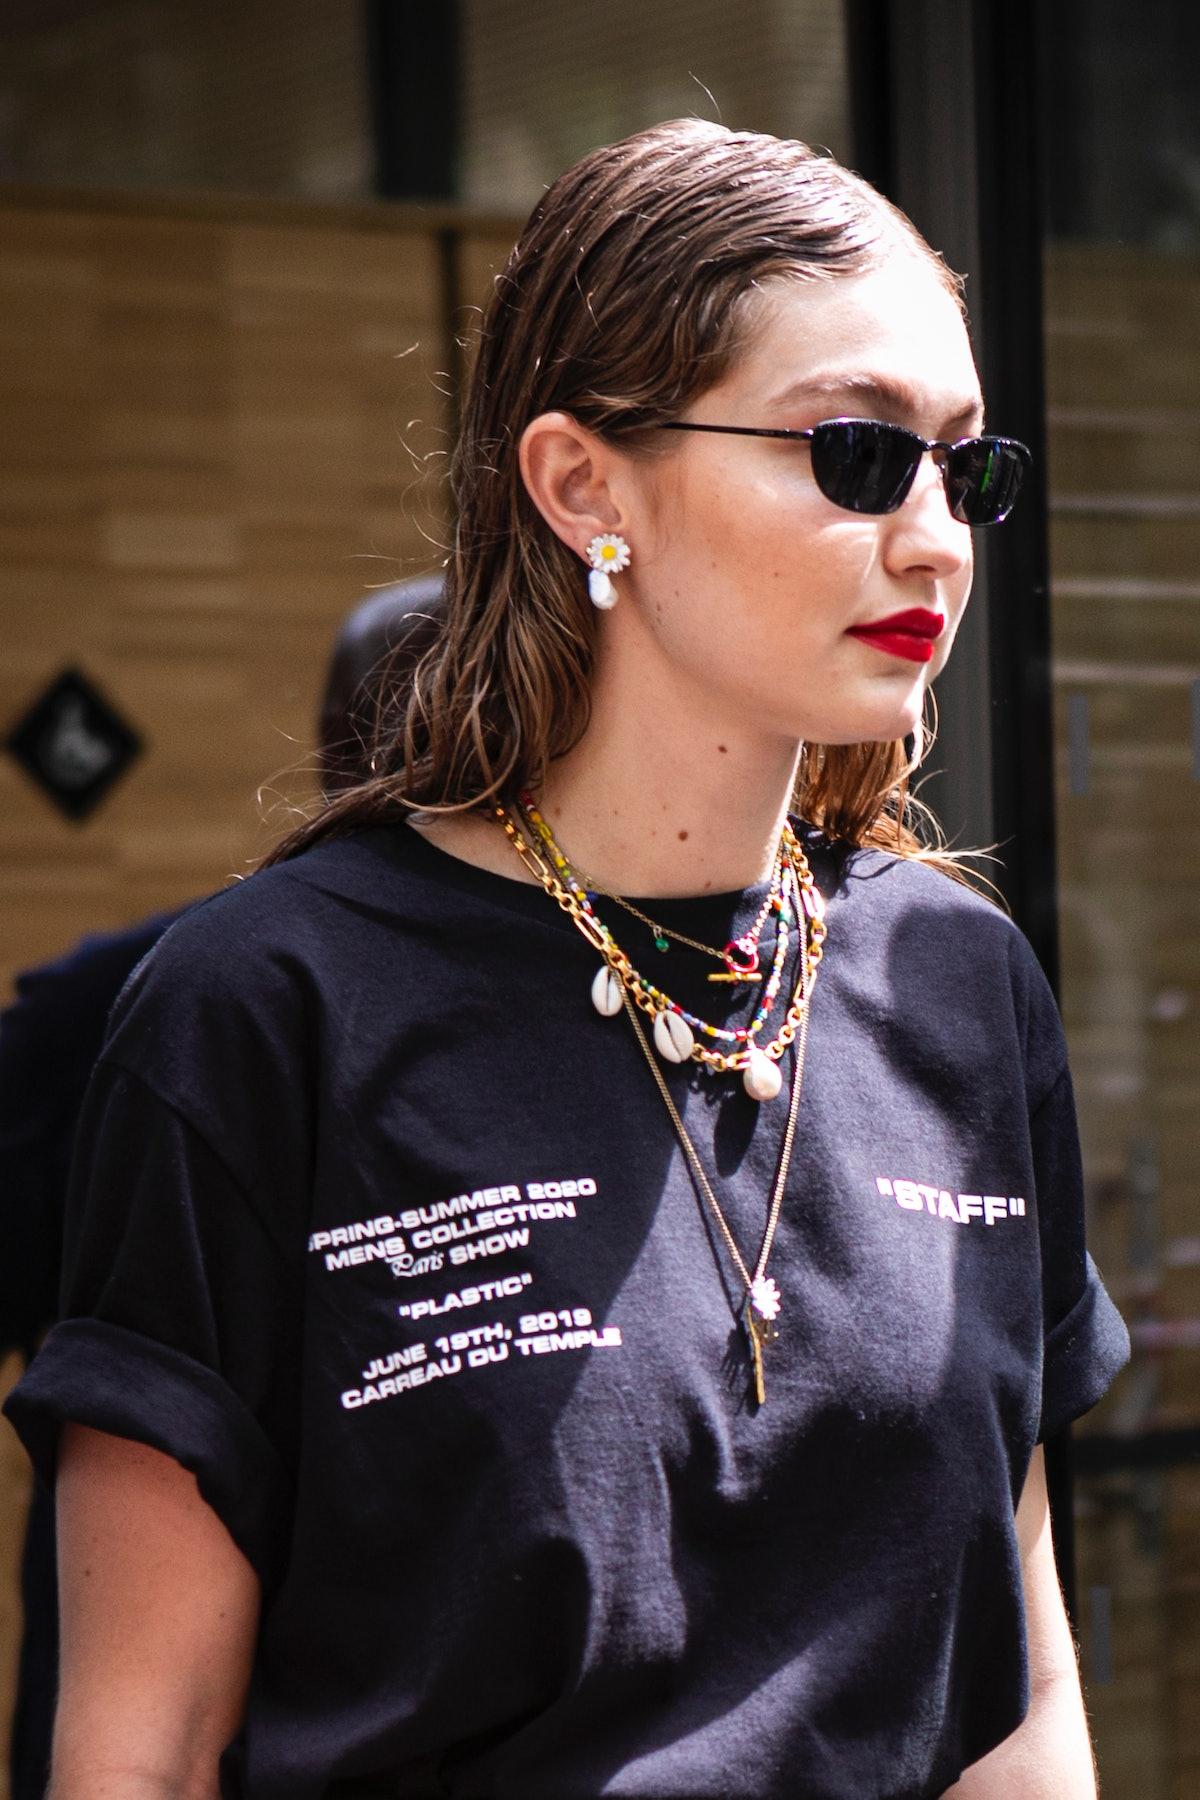 PARIS, FRANCE - JUNE 19: Gigi Hadid, wearing black sunglasses and black Off-White printed t-shirt, i...